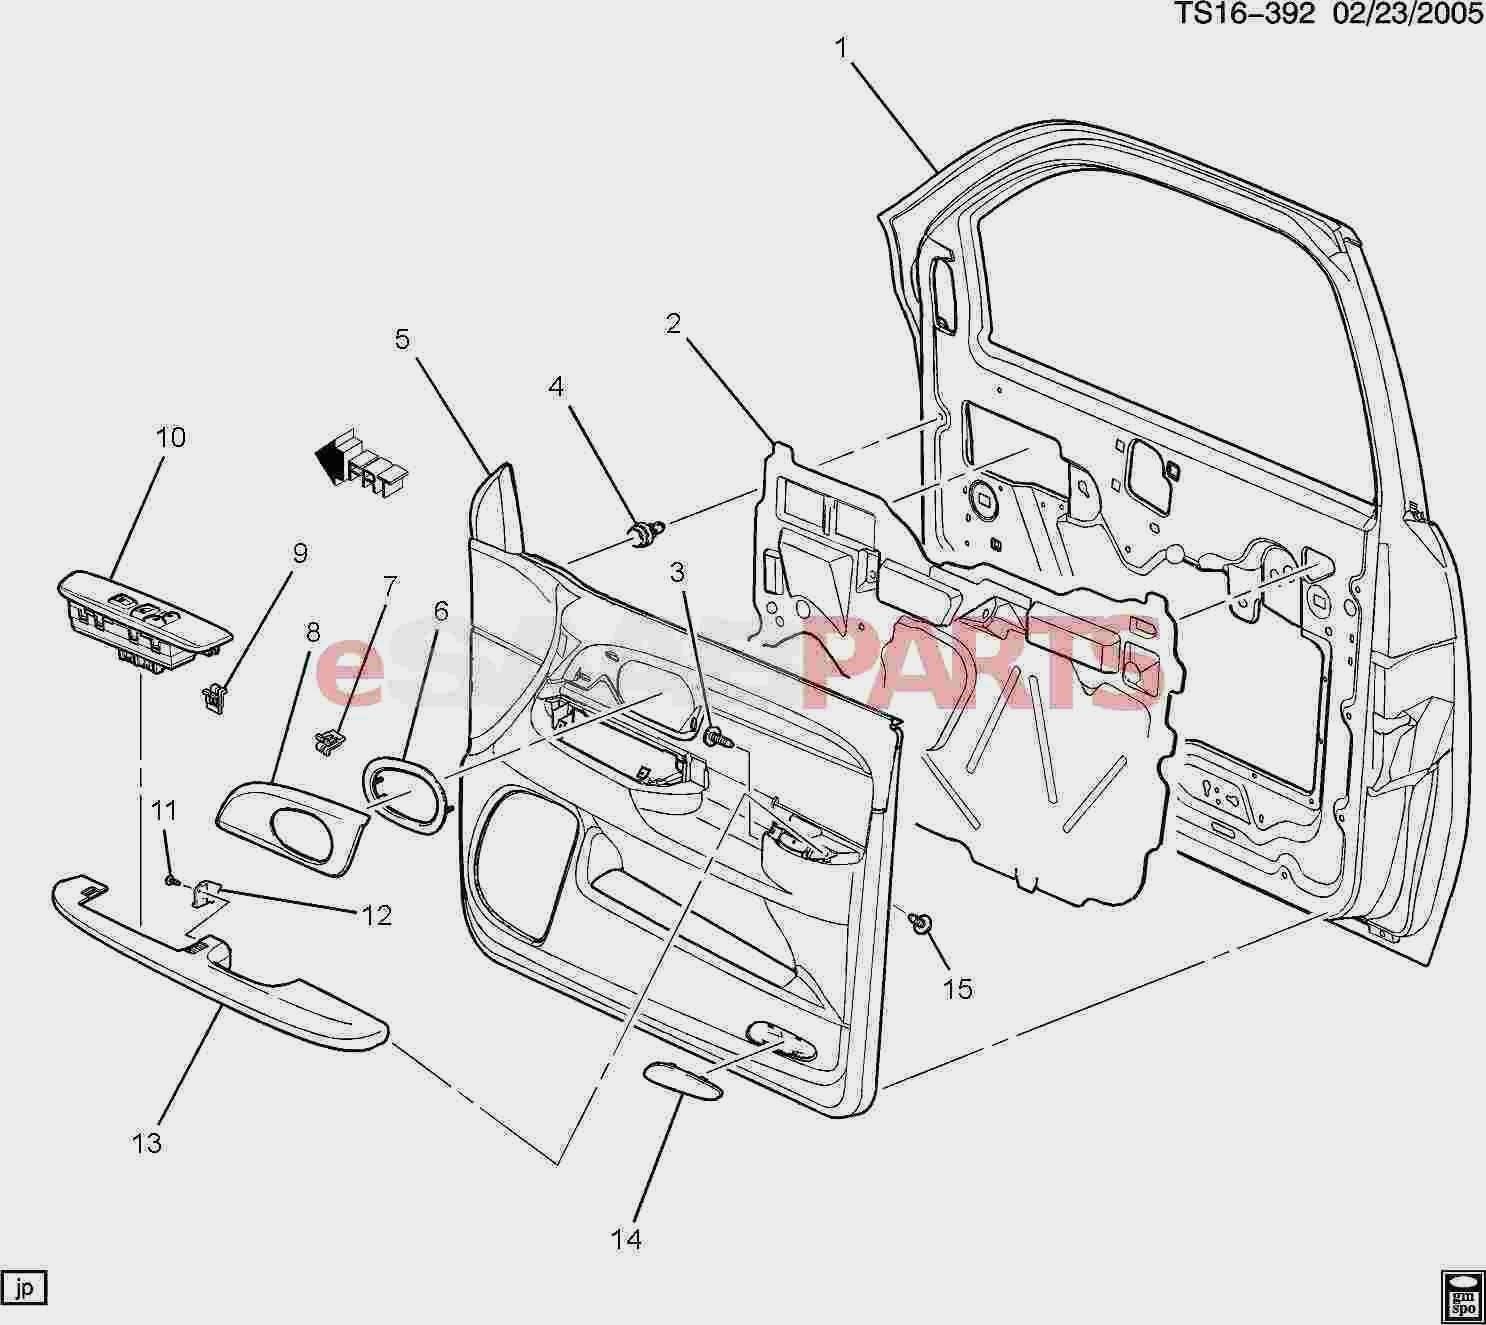 Parts Of Car Engine Diagram Saab Usa Parts Of Parts Of Car Engine Diagram